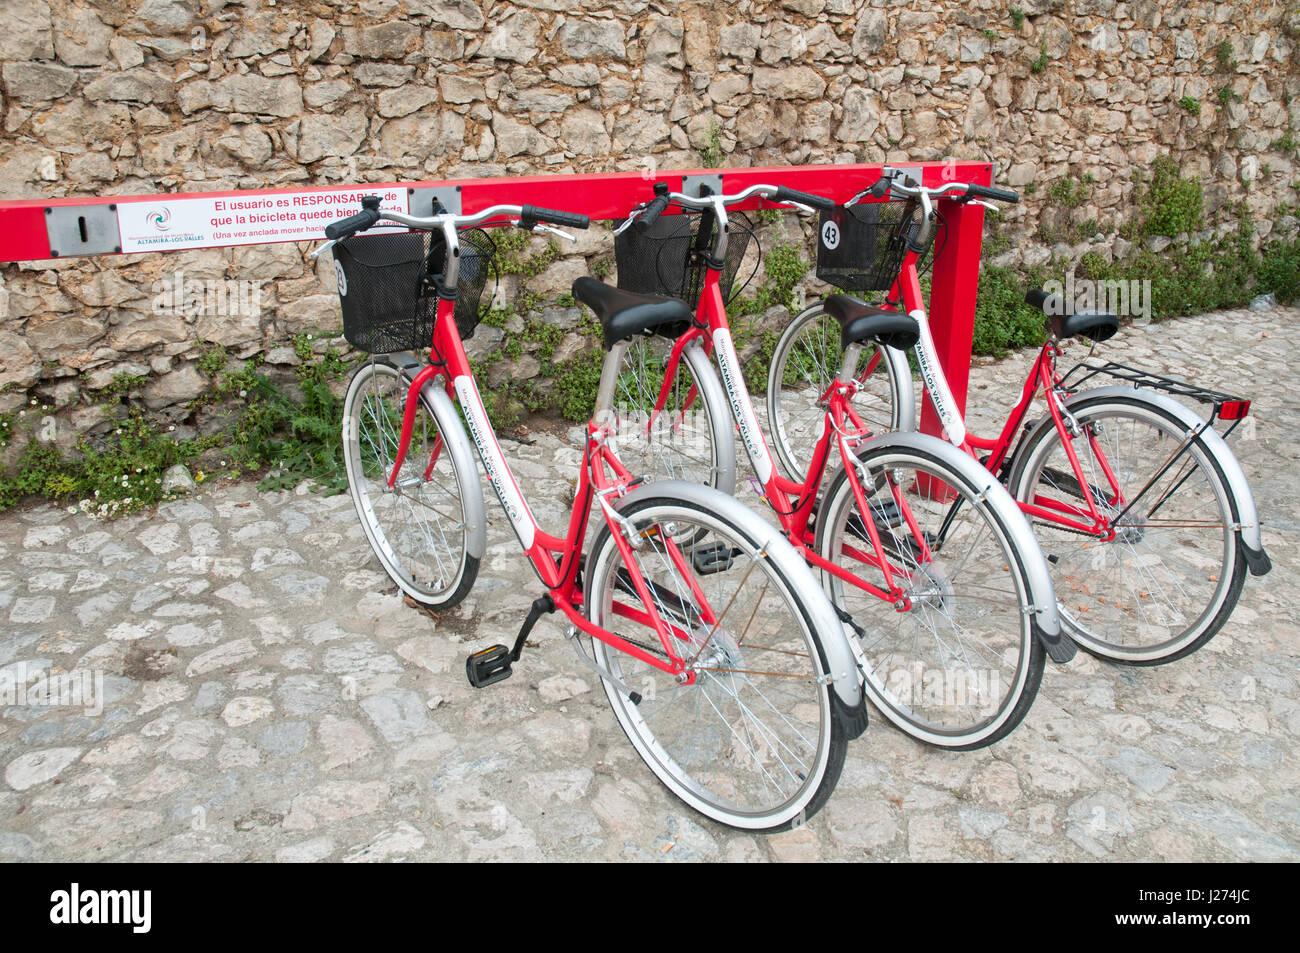 Hire bikes. Santillana del Mar, Cantabria, Spain. - Stock Image